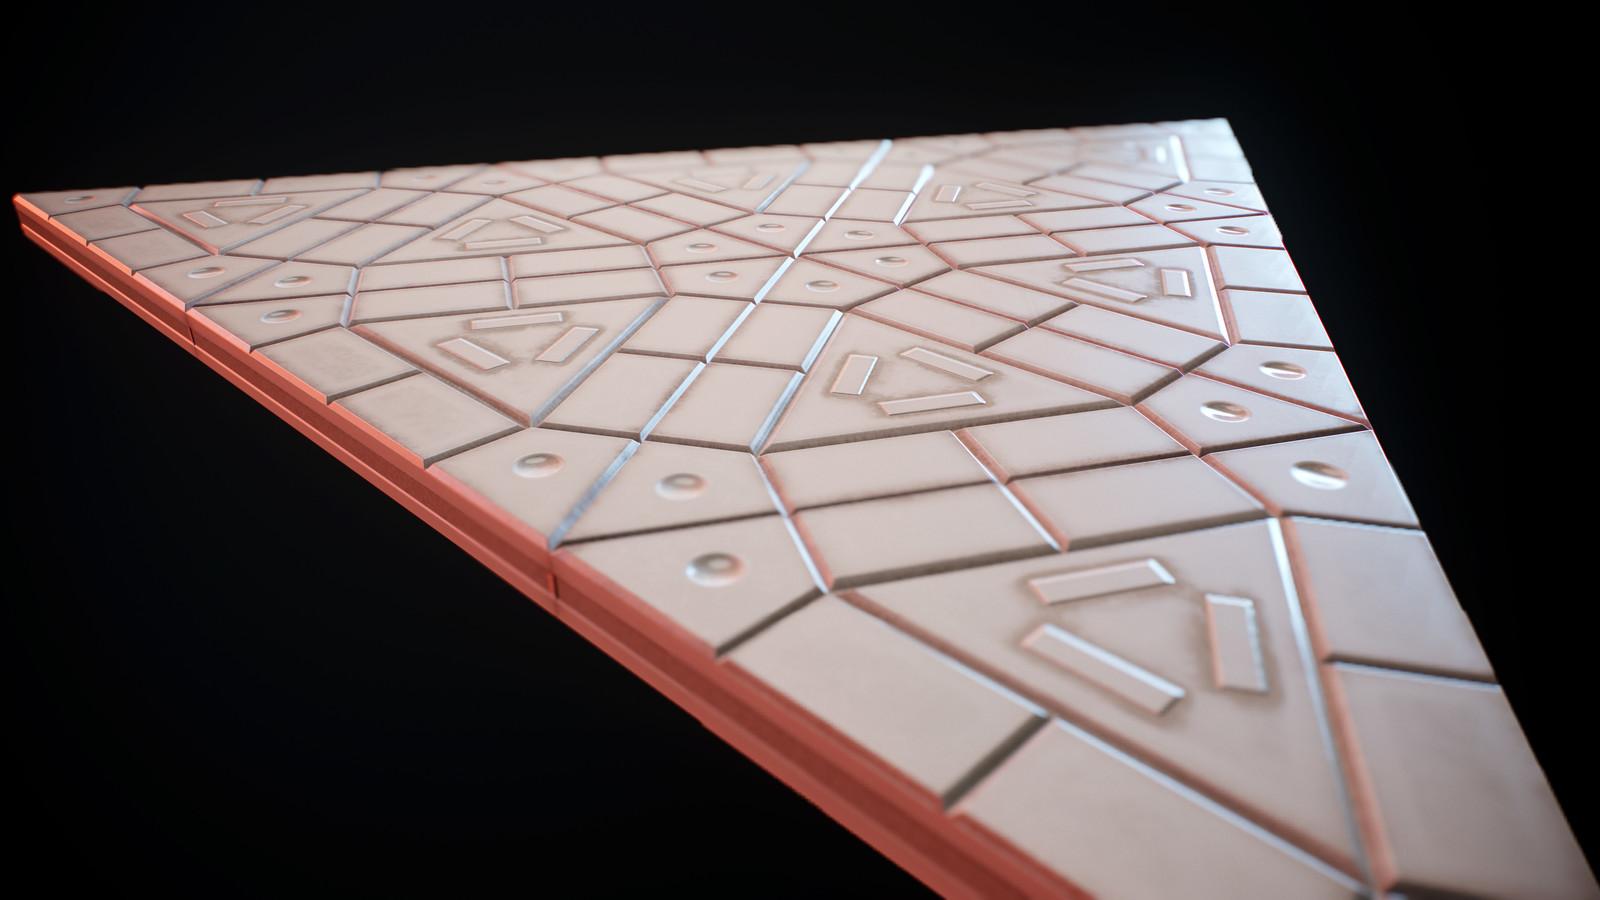 Triangular plastic ground close up